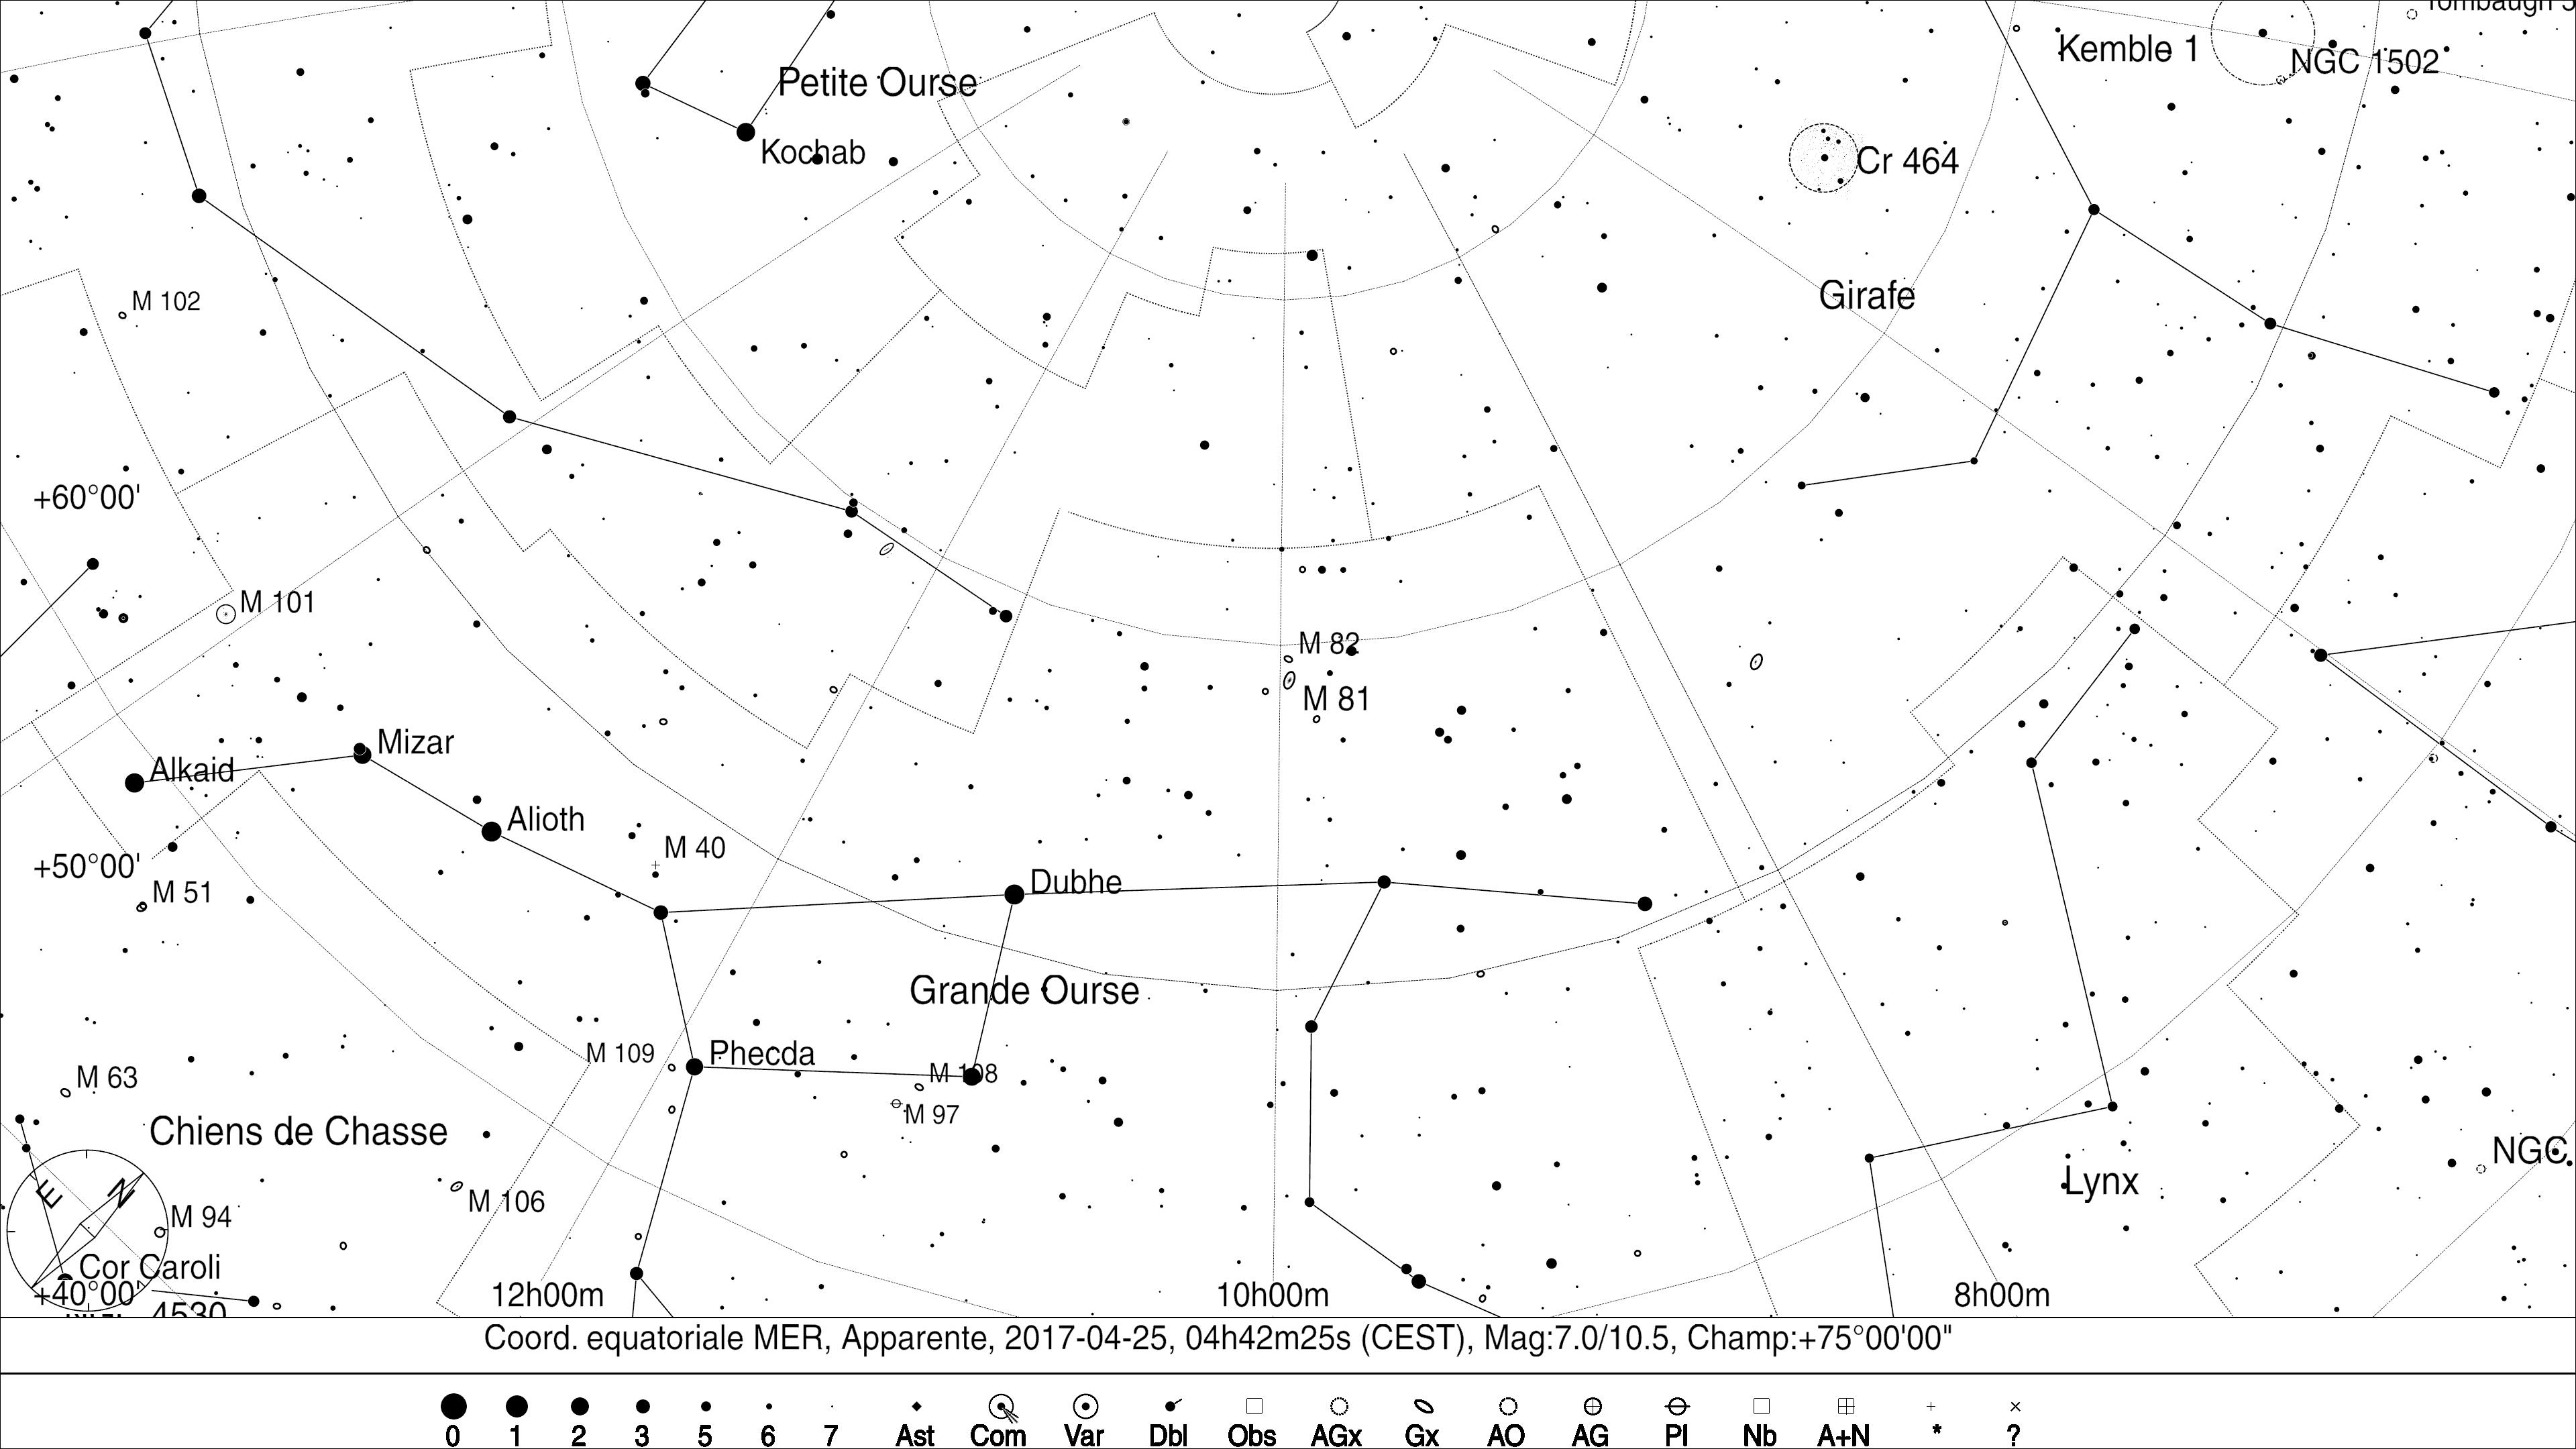 M82_75